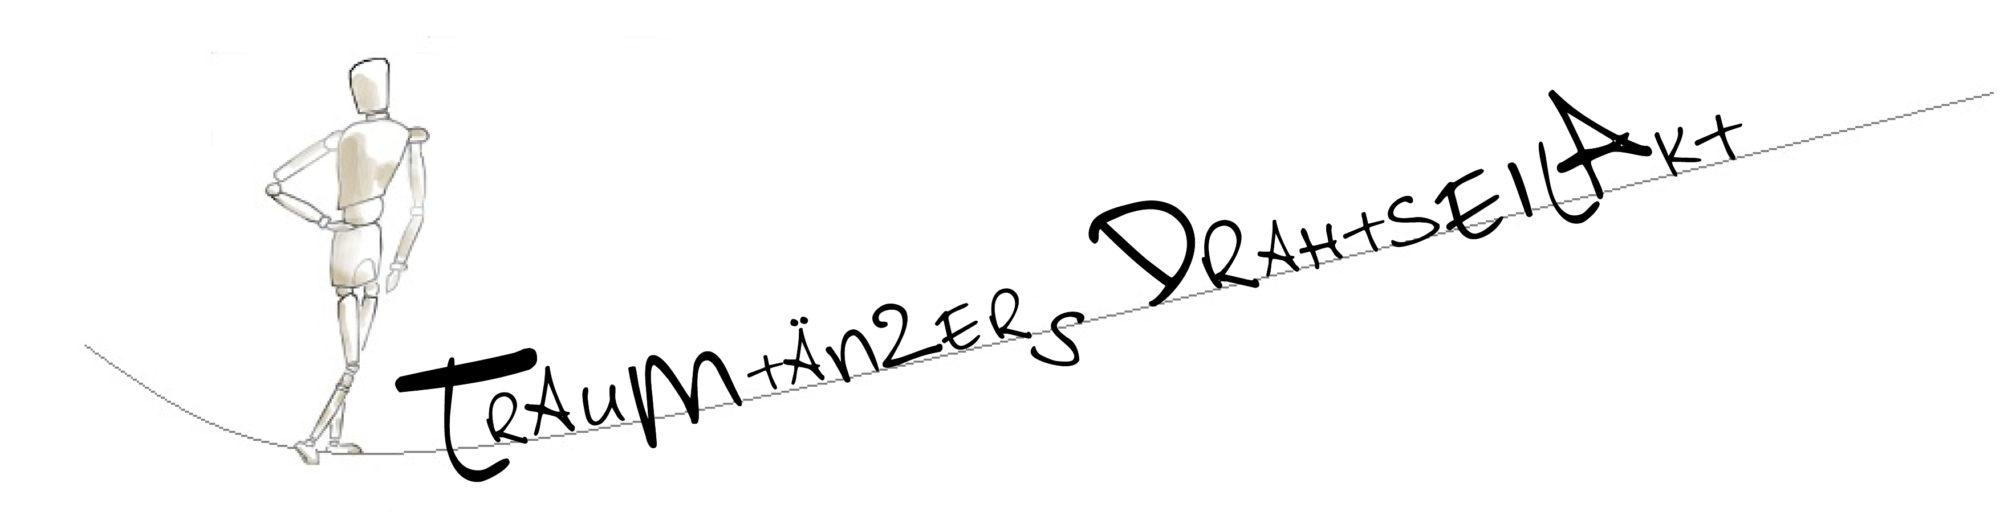 Traumtänzers-Drahtseilakt.de